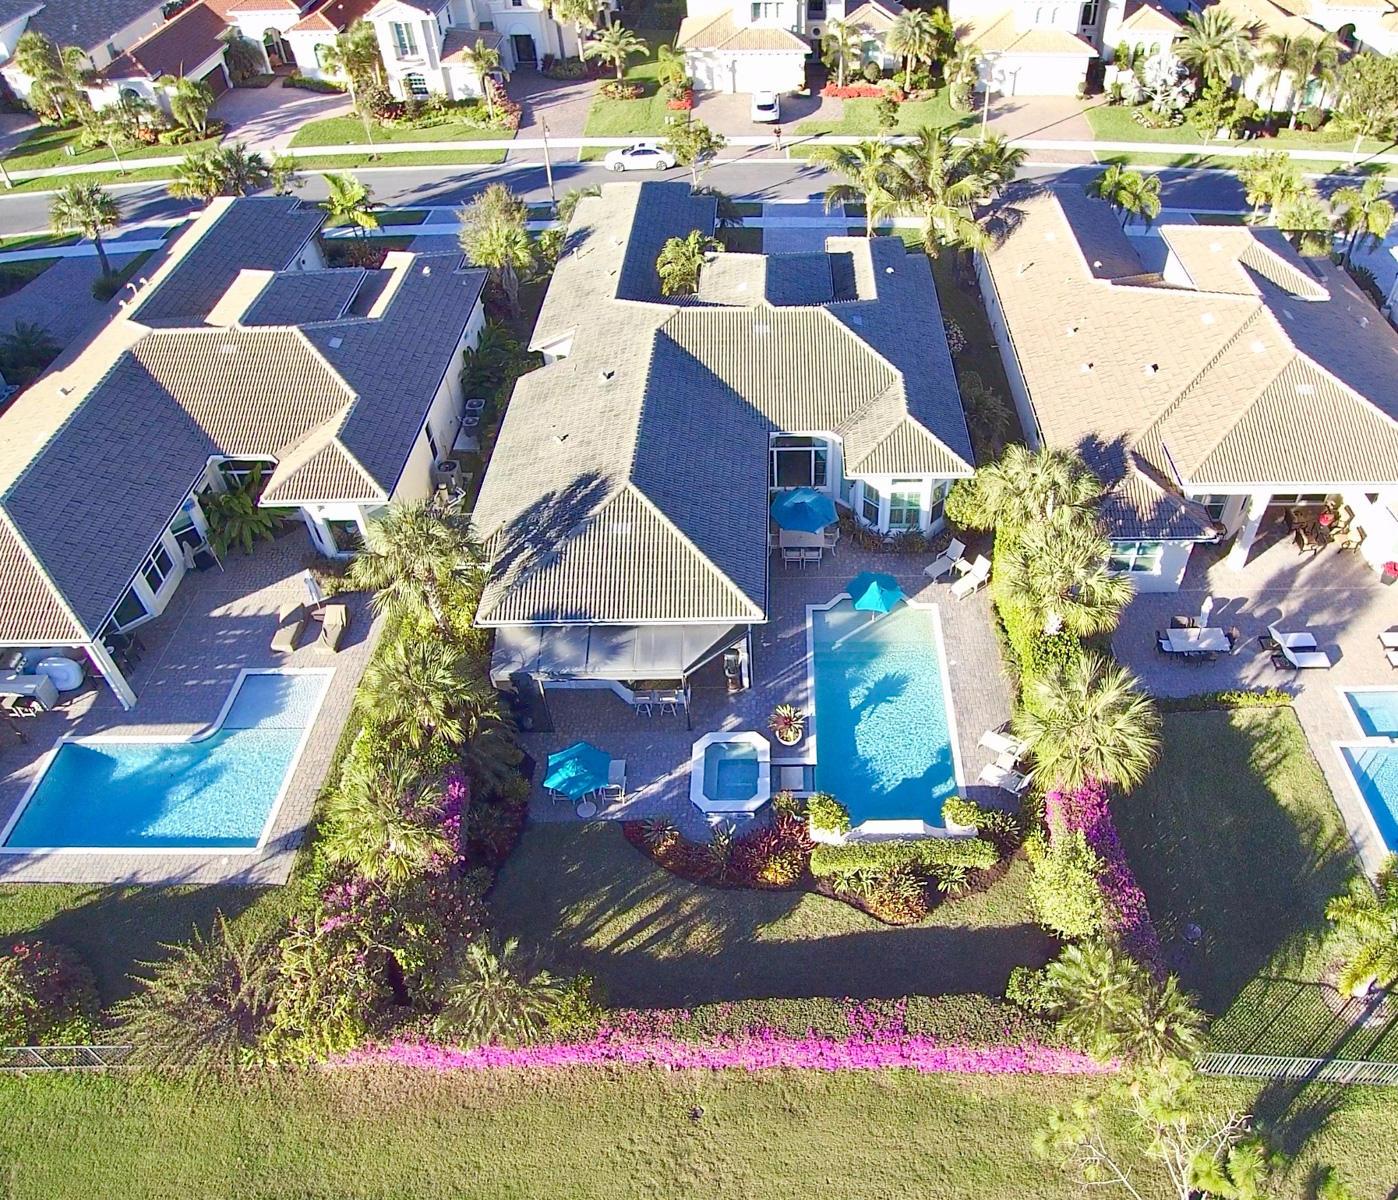 110 Carmela Court, Jupiter, Florida 33478, 4 Bedrooms Bedrooms, ,4 BathroomsBathrooms,A,Single family,Carmela,RX-10495791